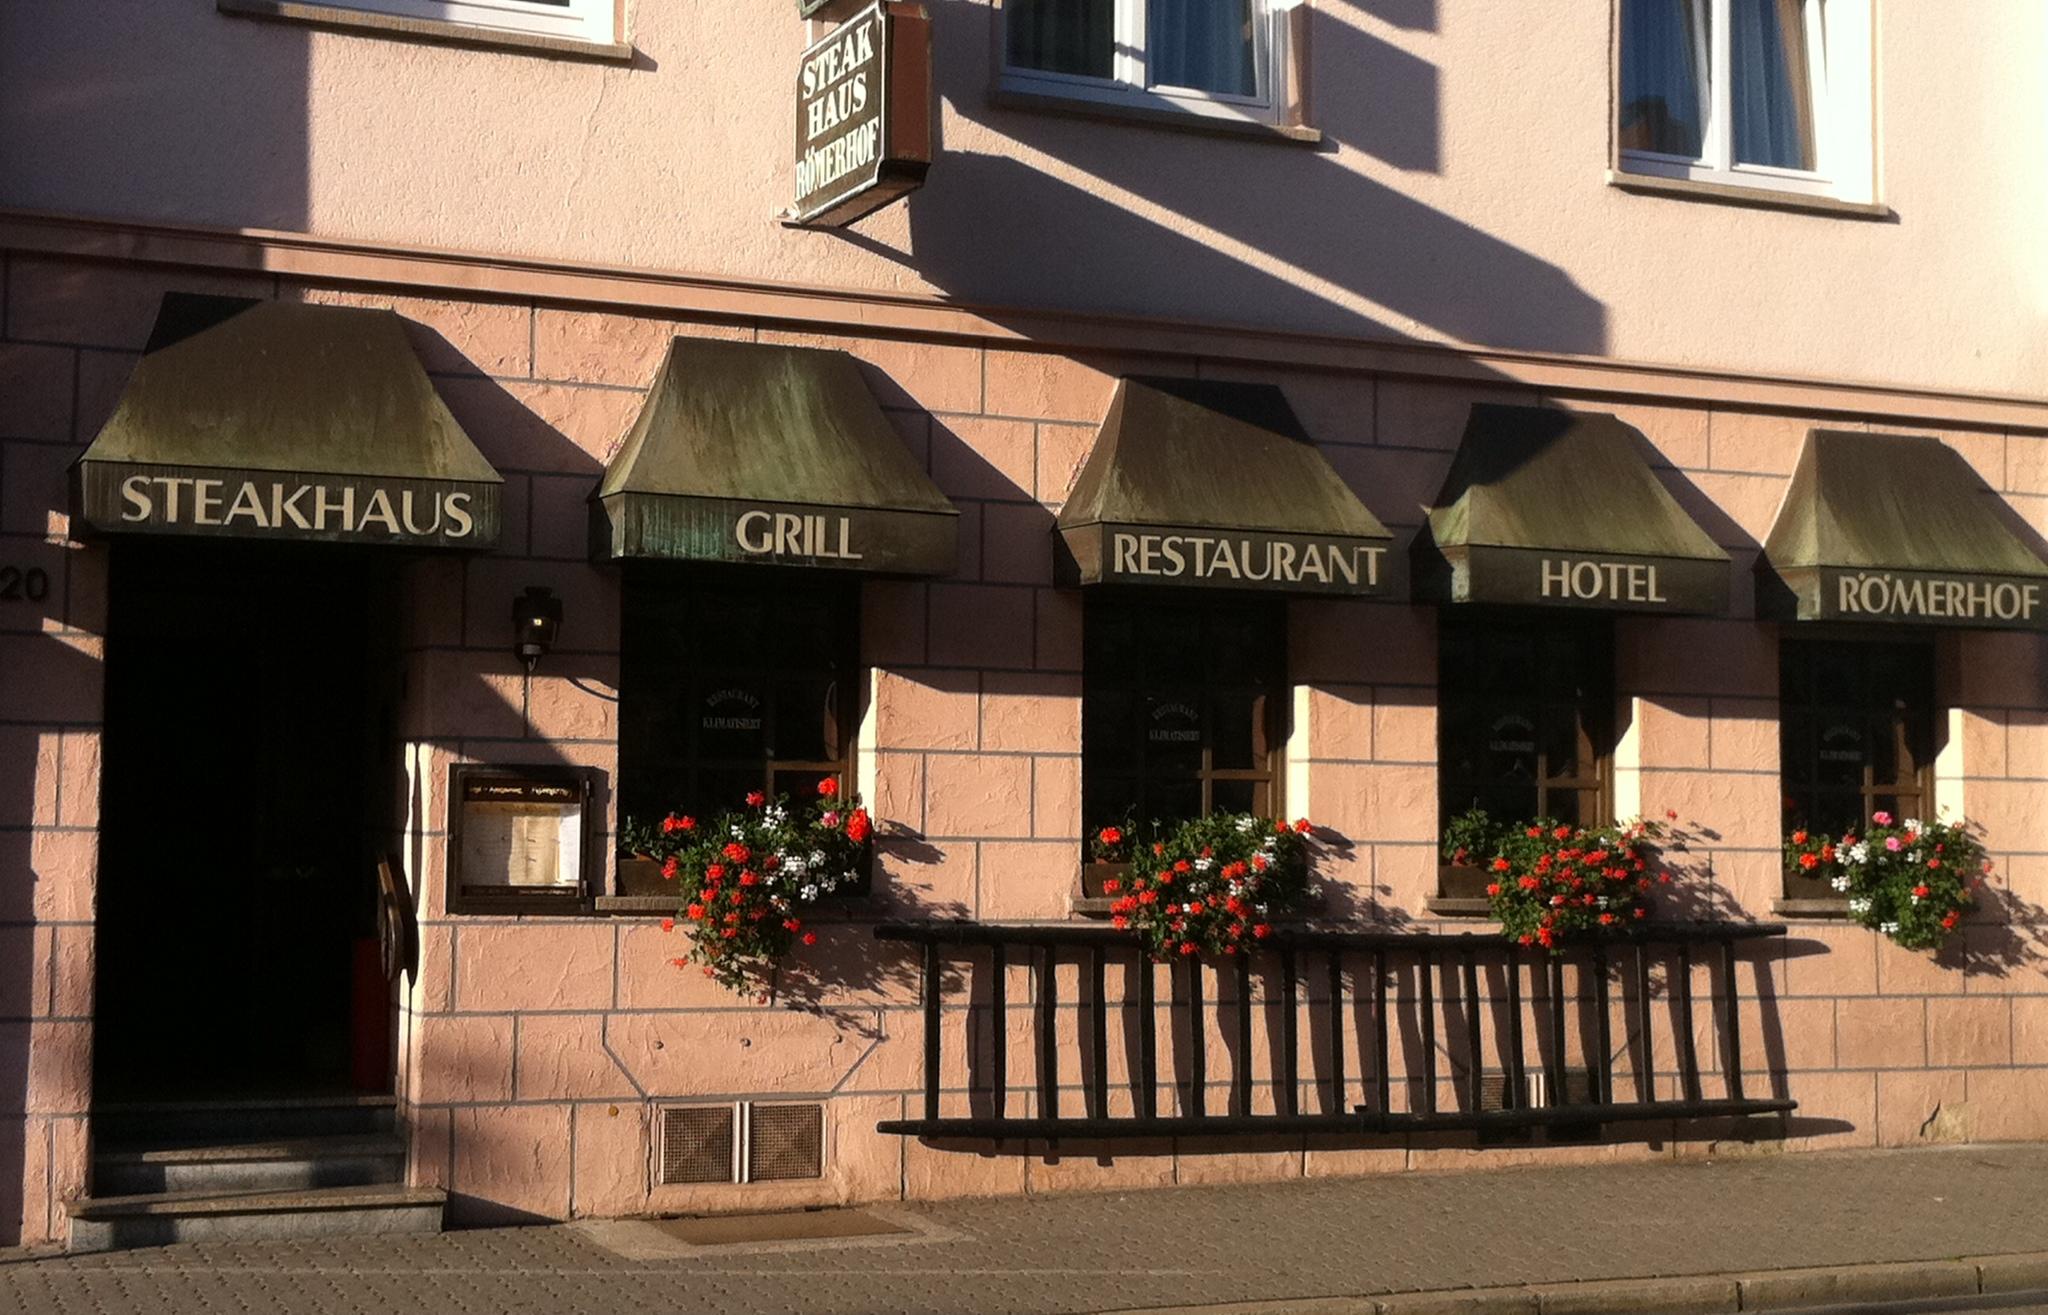 hotel restaurant r merhof restaurants hanau infobel deutschland telefon 0618192780. Black Bedroom Furniture Sets. Home Design Ideas